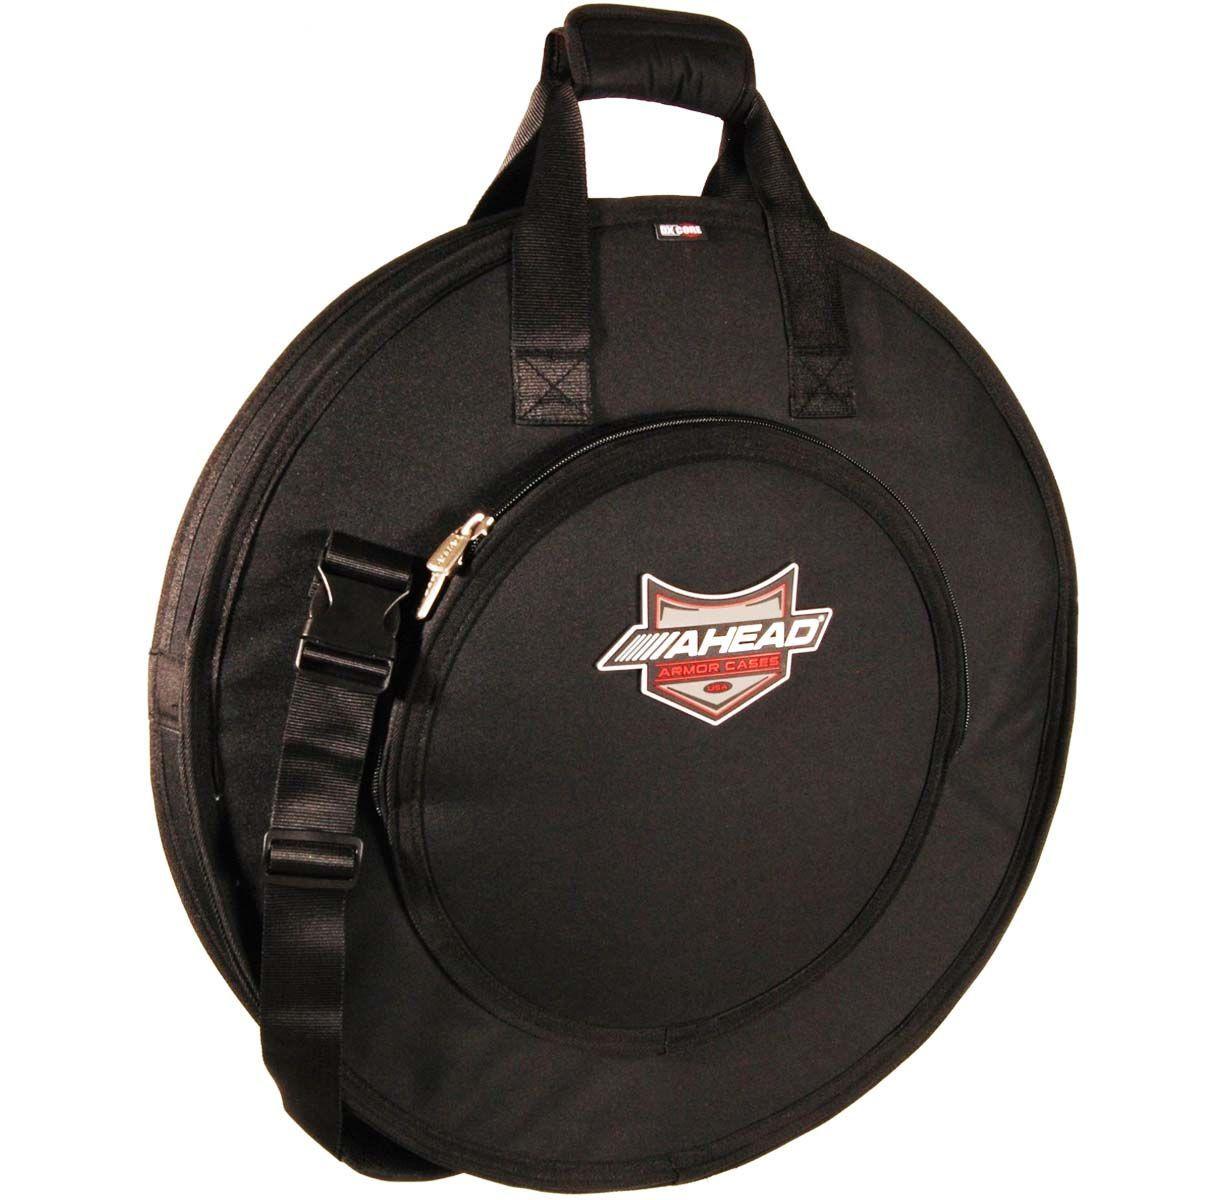 Ahead Armor Deluxe Cymbal Bag AA6021